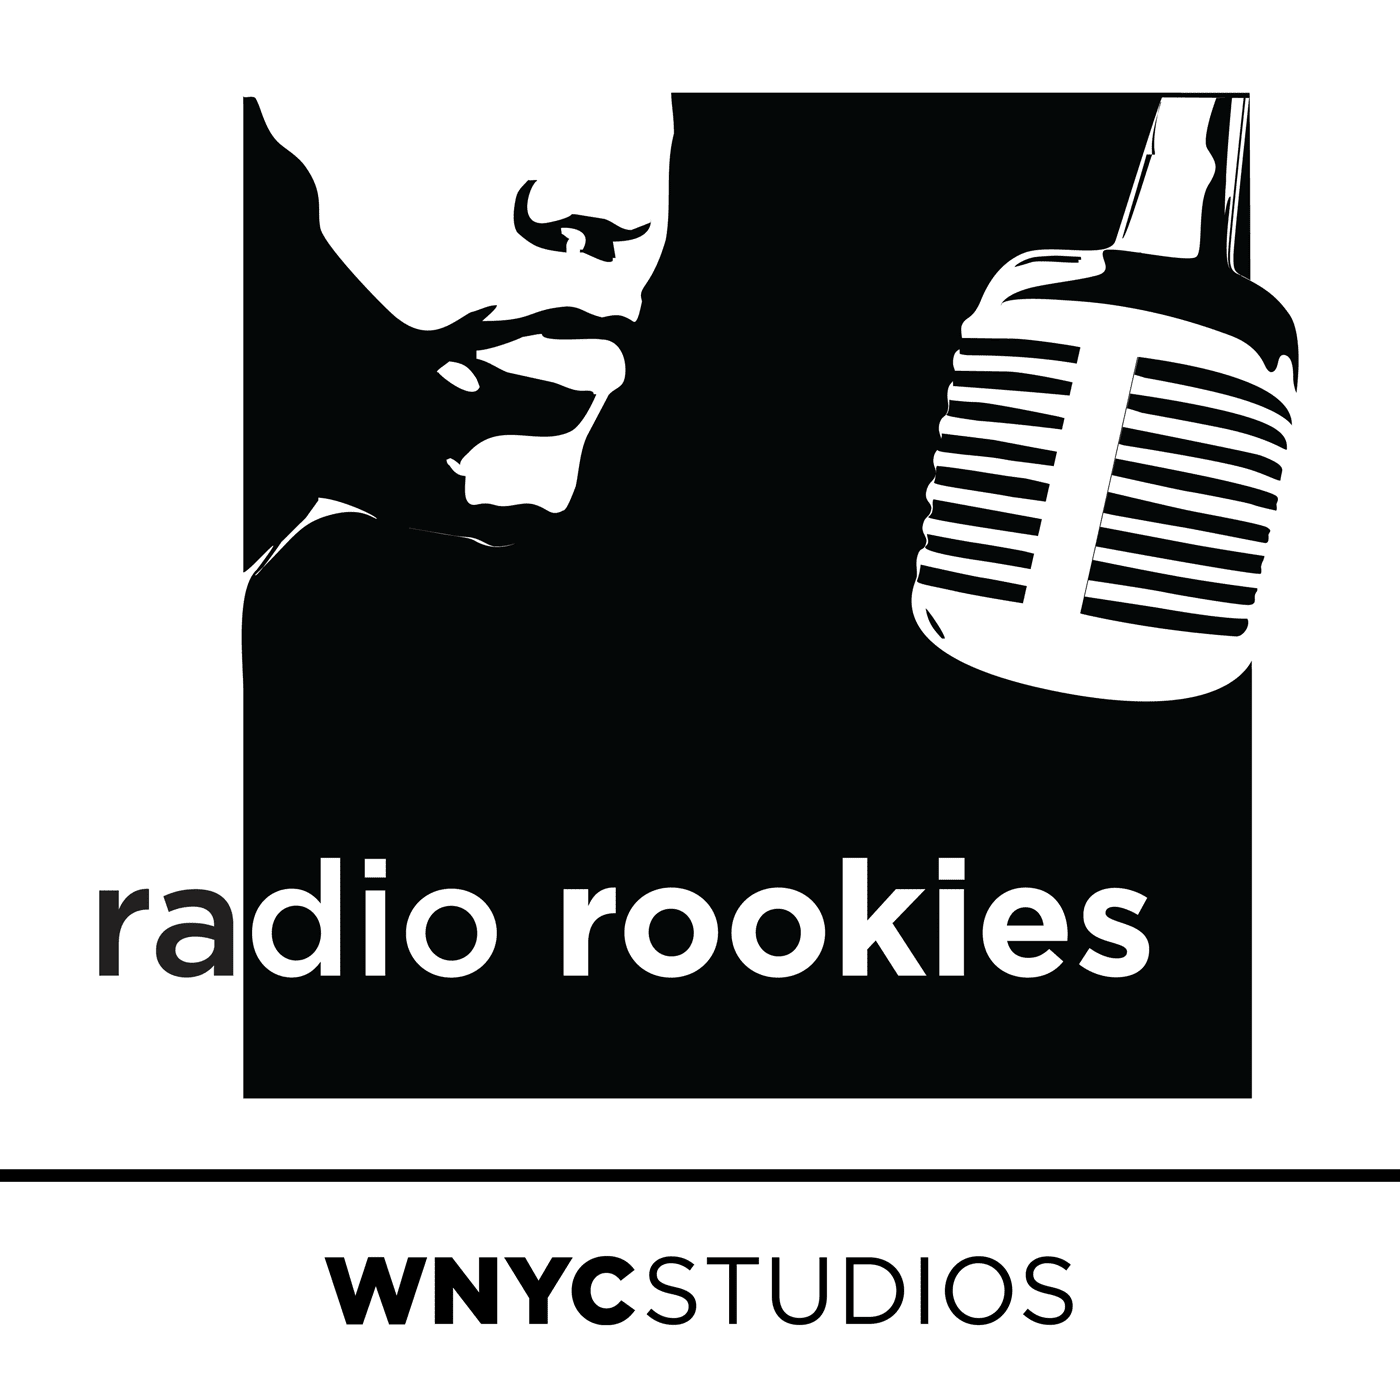 RadioRookies_WNYCStudios_1400.png